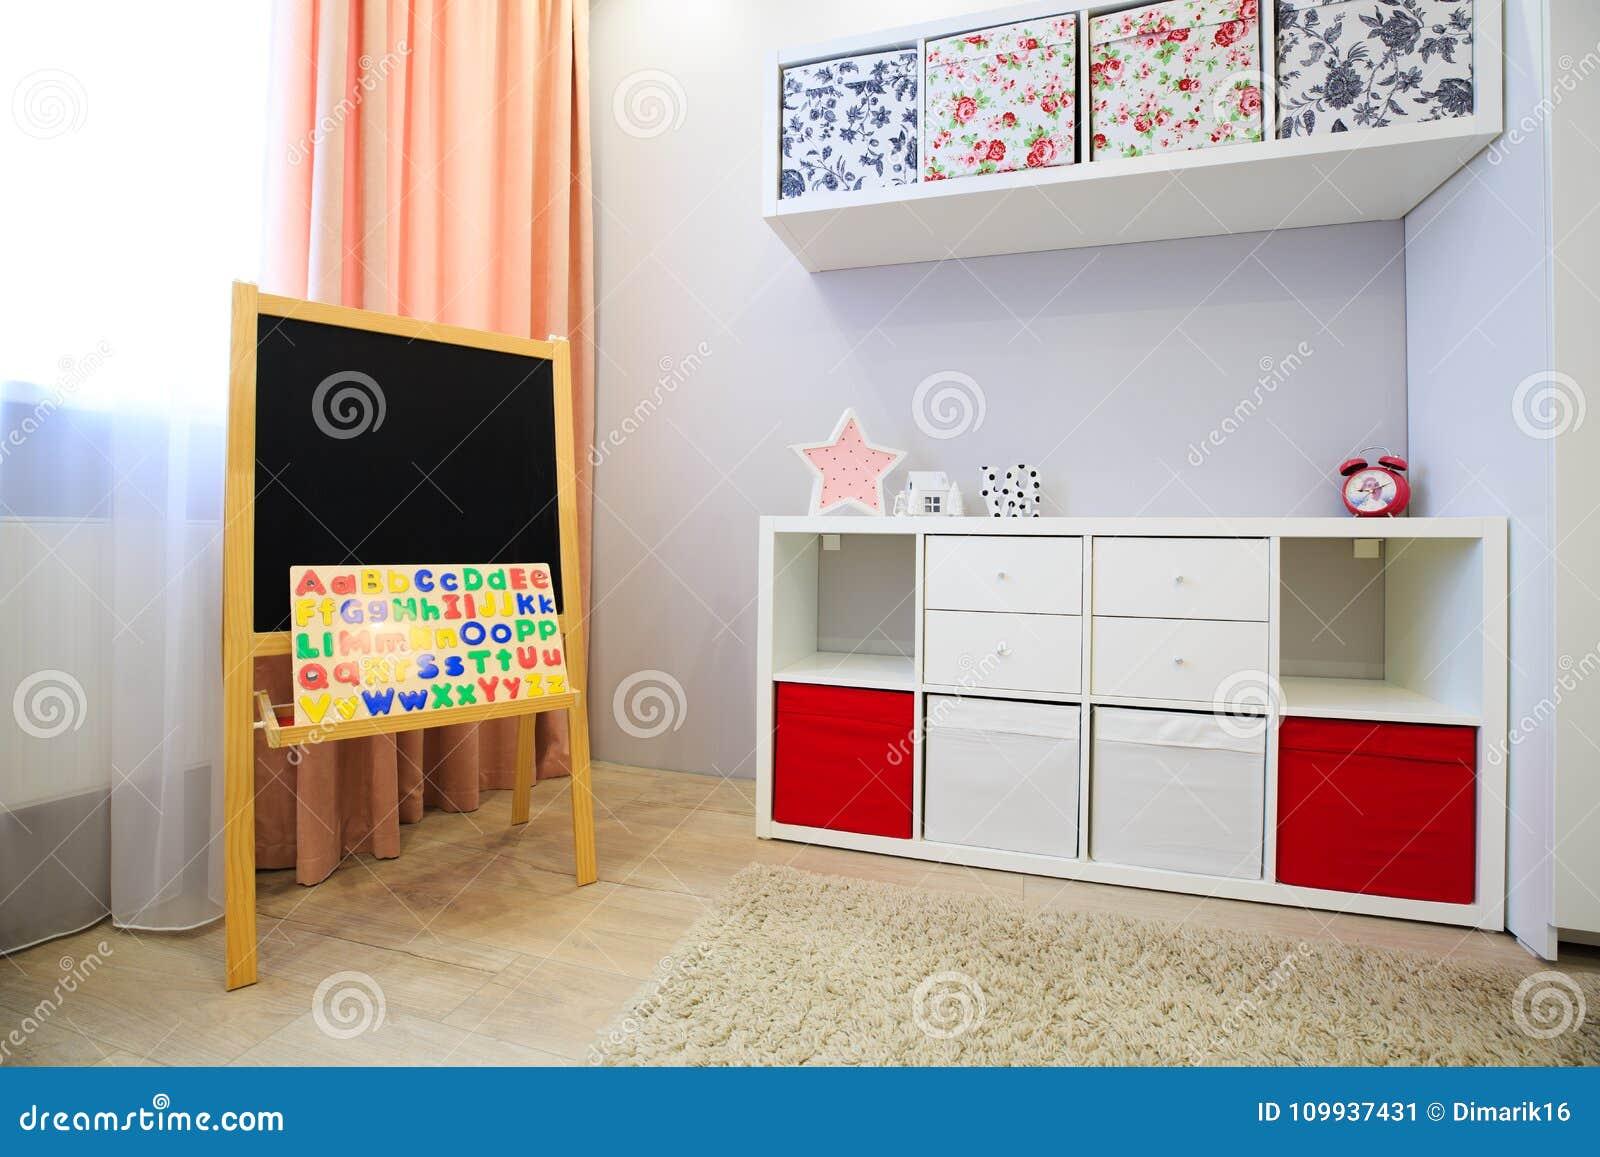 Interior of children room stock image. Image of children - 109937431